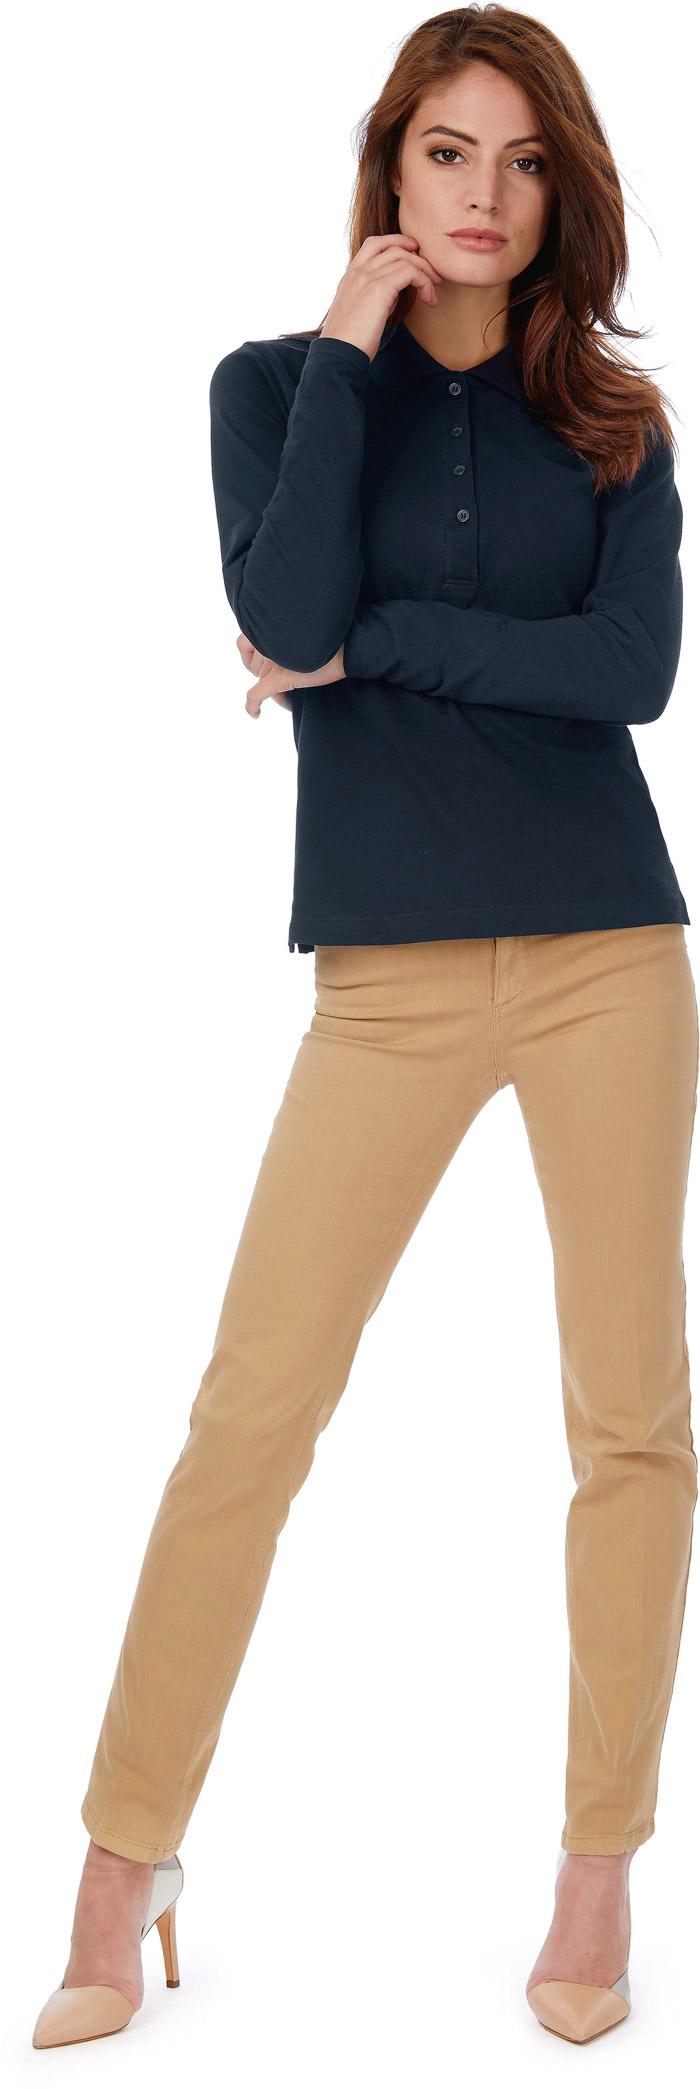 Polo femme safran manches longues - CGPW456